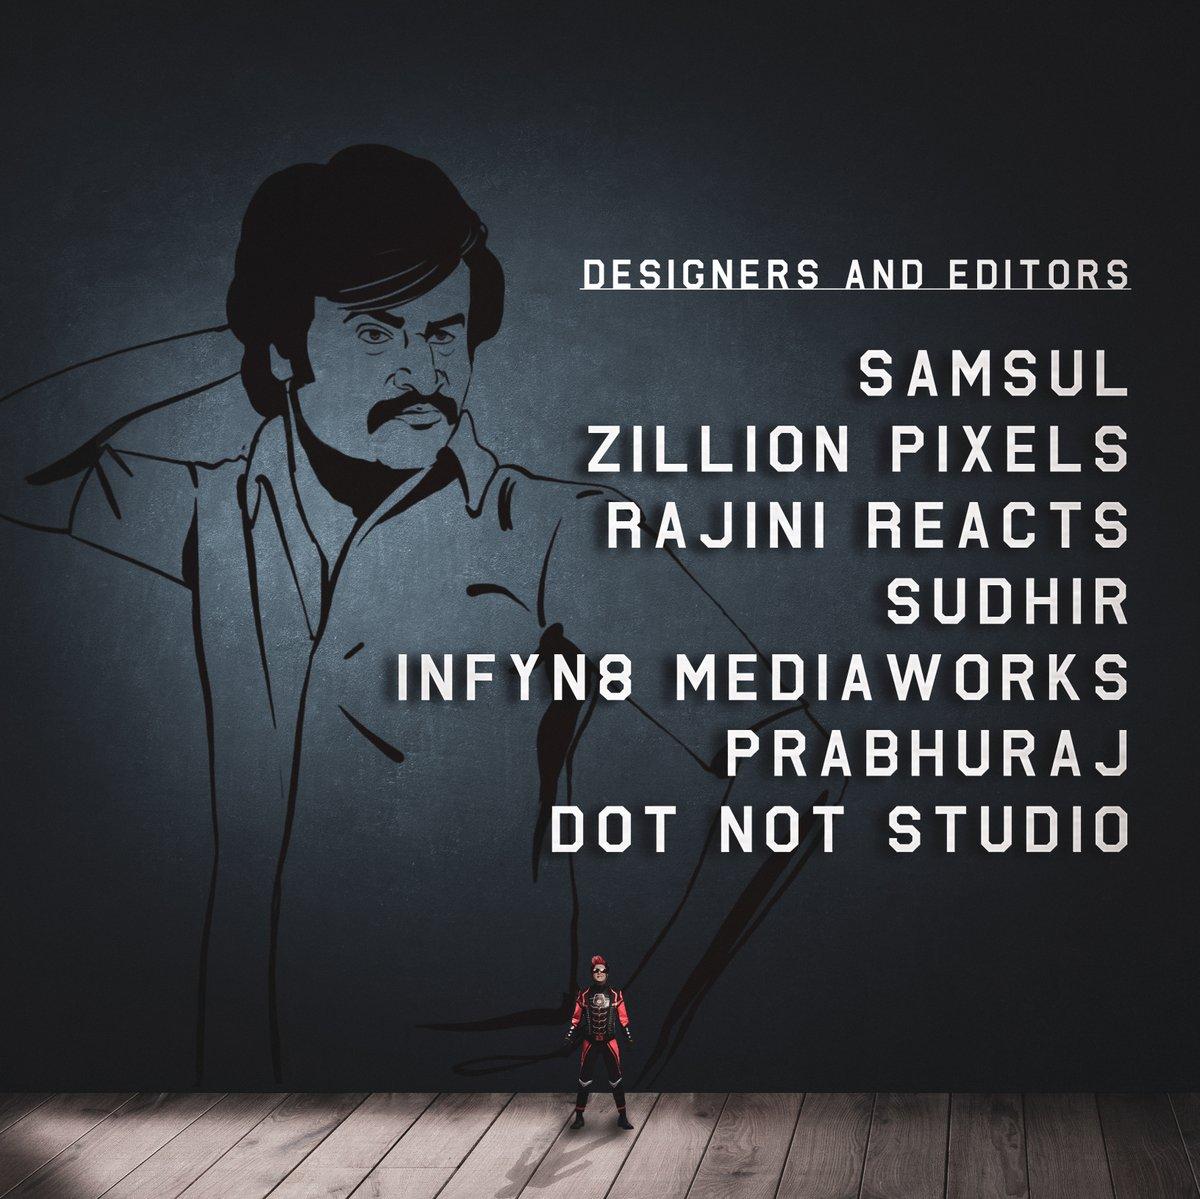 Thanks to our designers & editors!  Announcement Poster Design: @ZillionPixels  Supporting Designs: #Samsul @Infyn8_Off @dotnot_studio @imprabhuraj  Announcement Video Editing: @SudhirL_Raana  Trend Alert Videos: @rajinireacts  #HBDSuperstarRajinikanth #Annaatthe @TDT_RajiniEdits